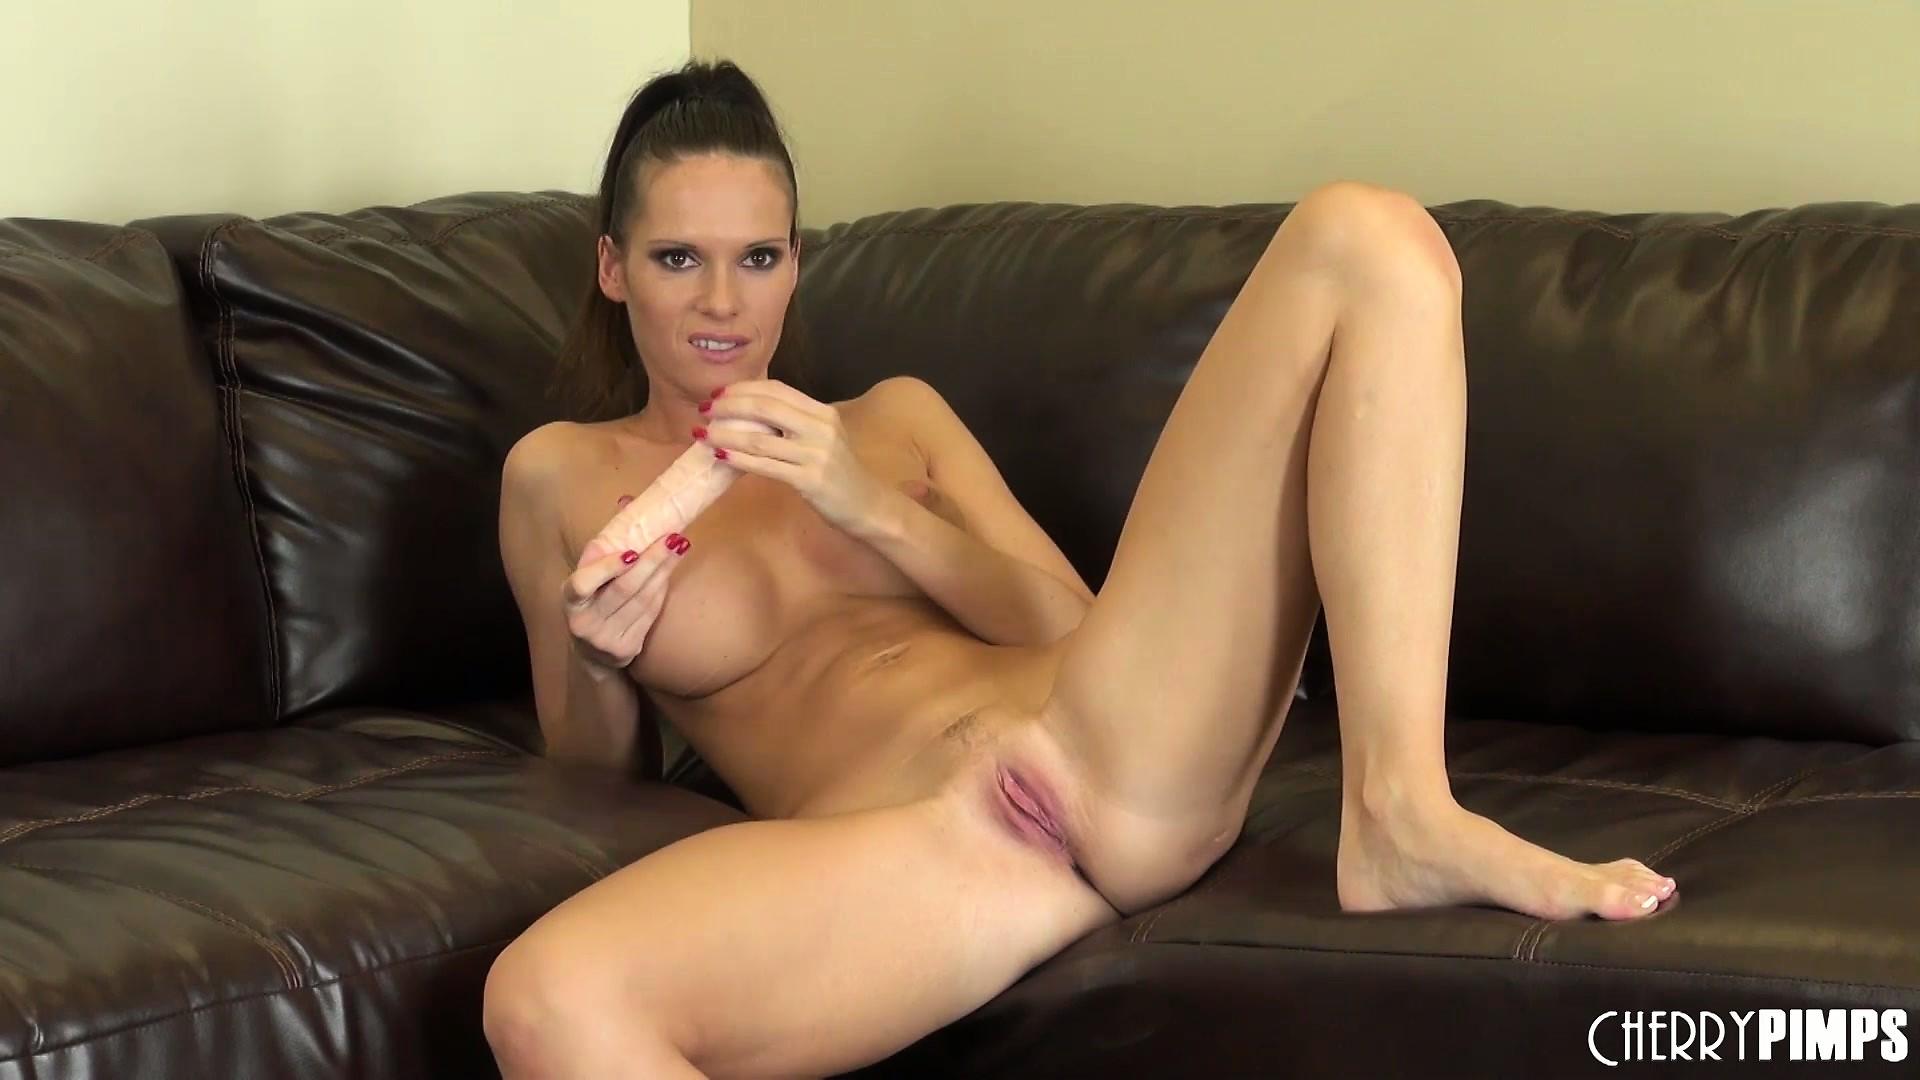 Jennifer Dark Videos free mobile porn & sex videos & sex movies - jennifer dark